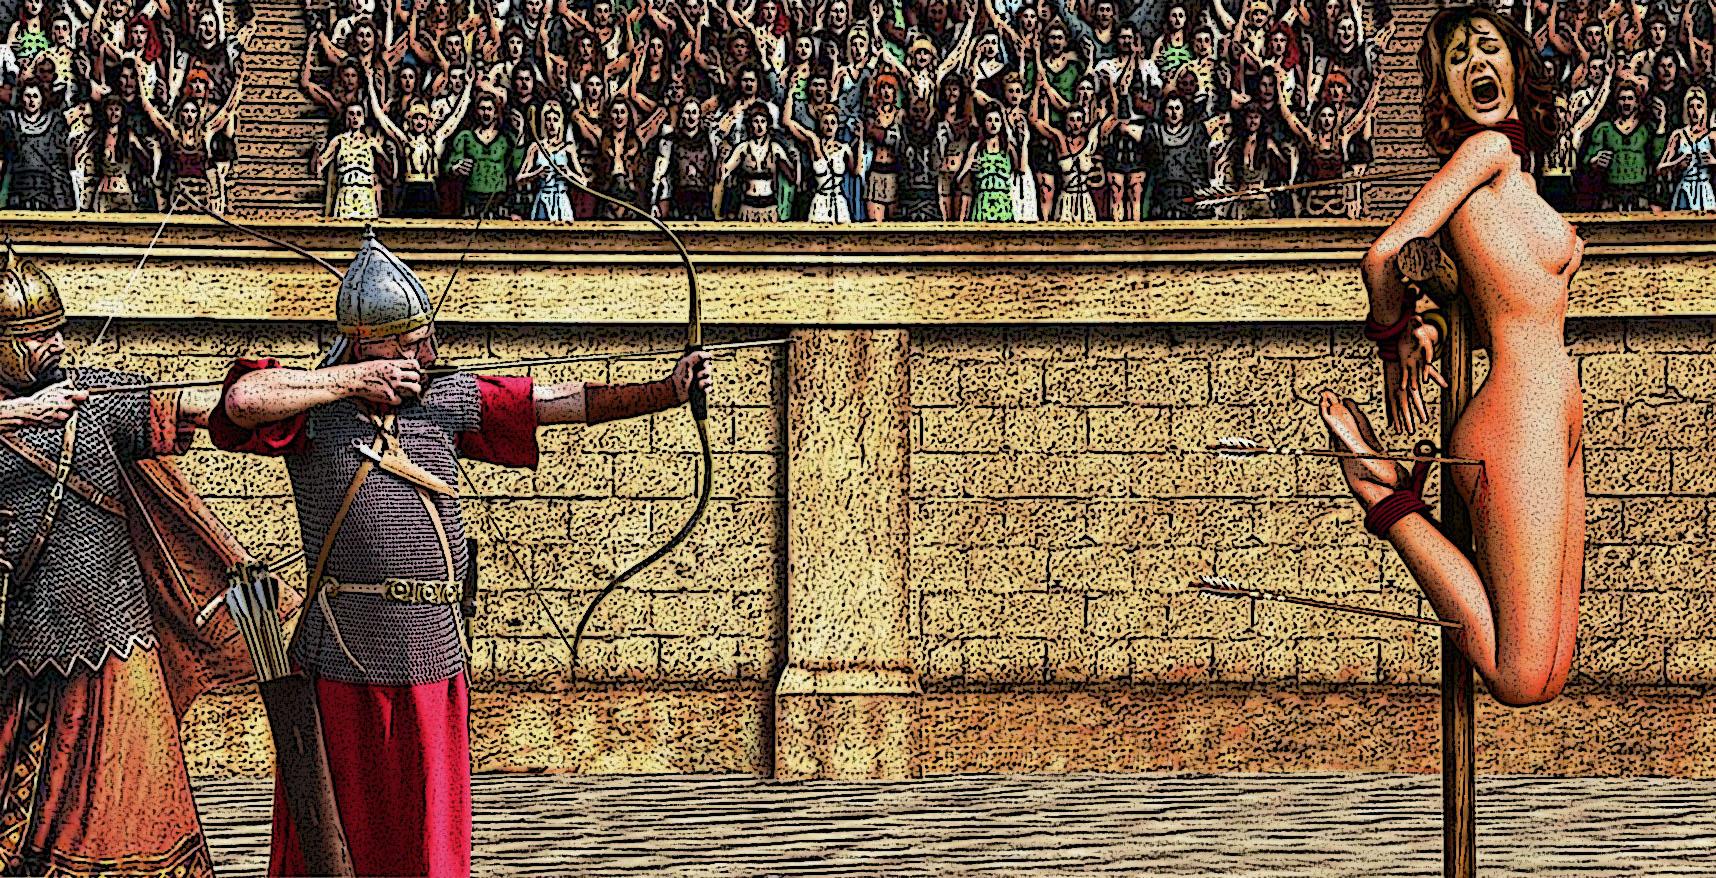 Roman heart cort donovan gay porn photo